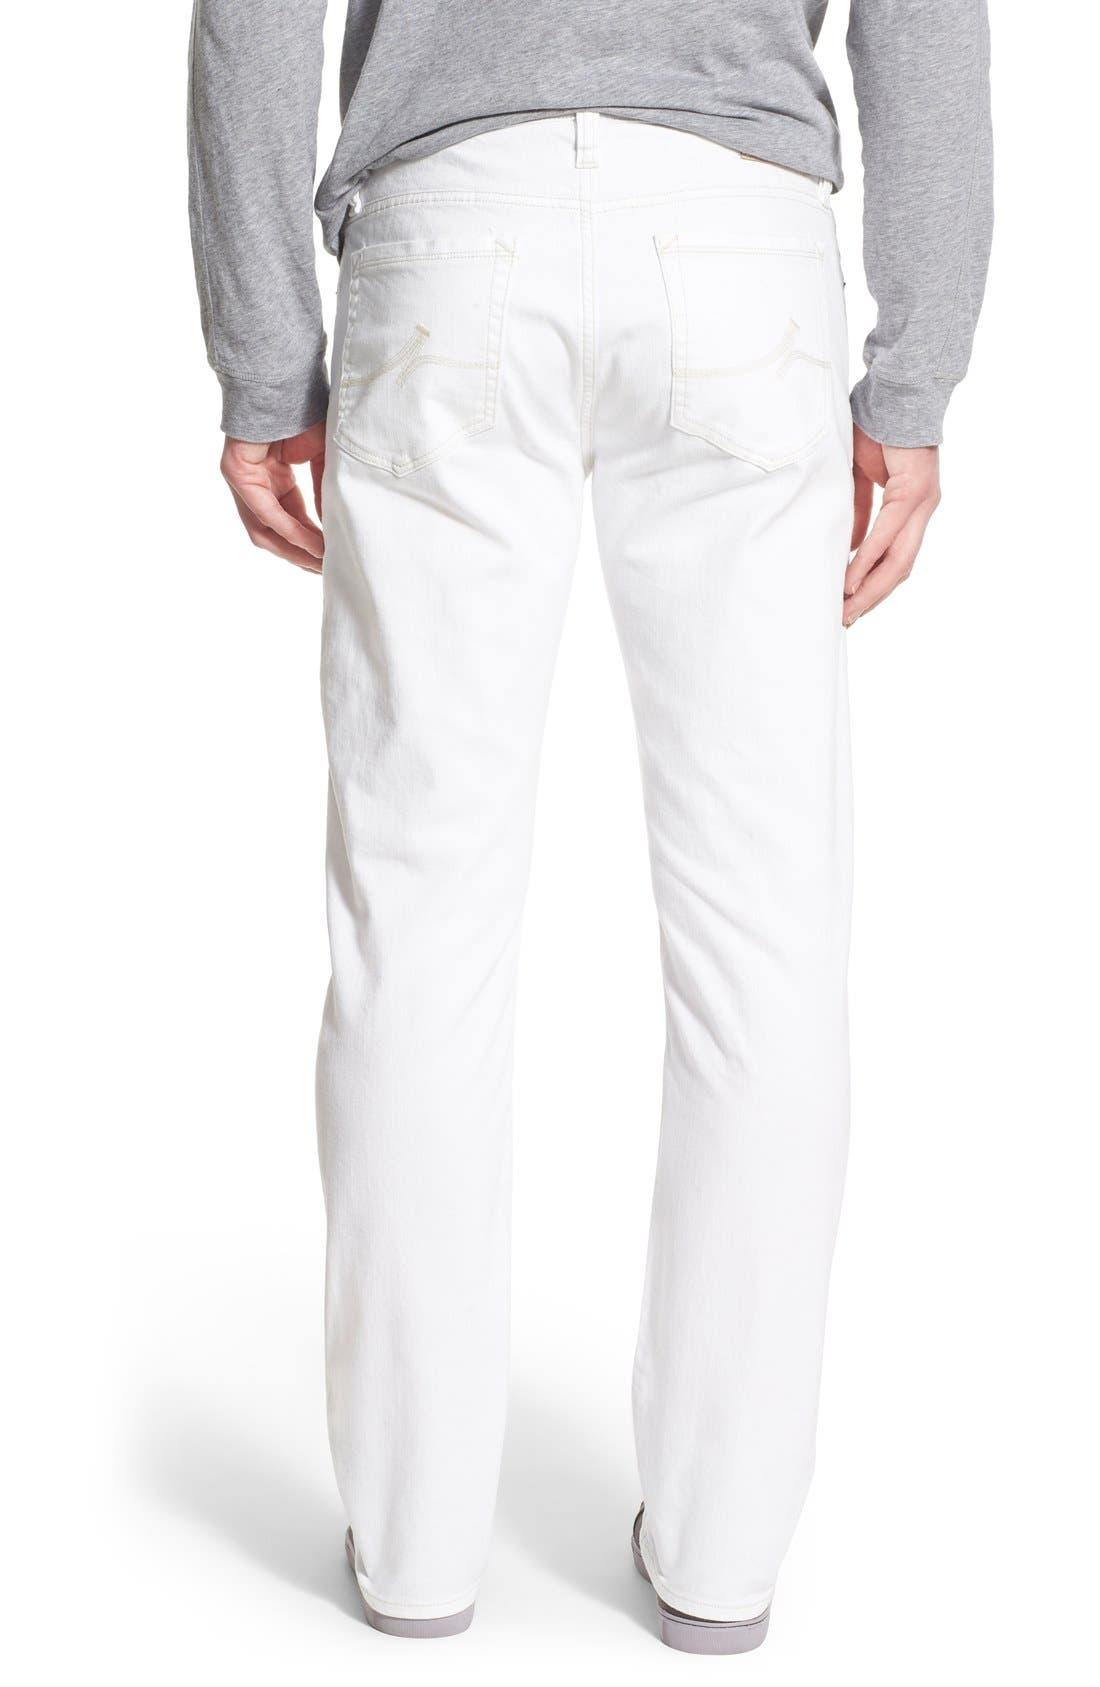 'Courage' Straight Leg Jeans,                             Alternate thumbnail 3, color,                             WHITE DENIM